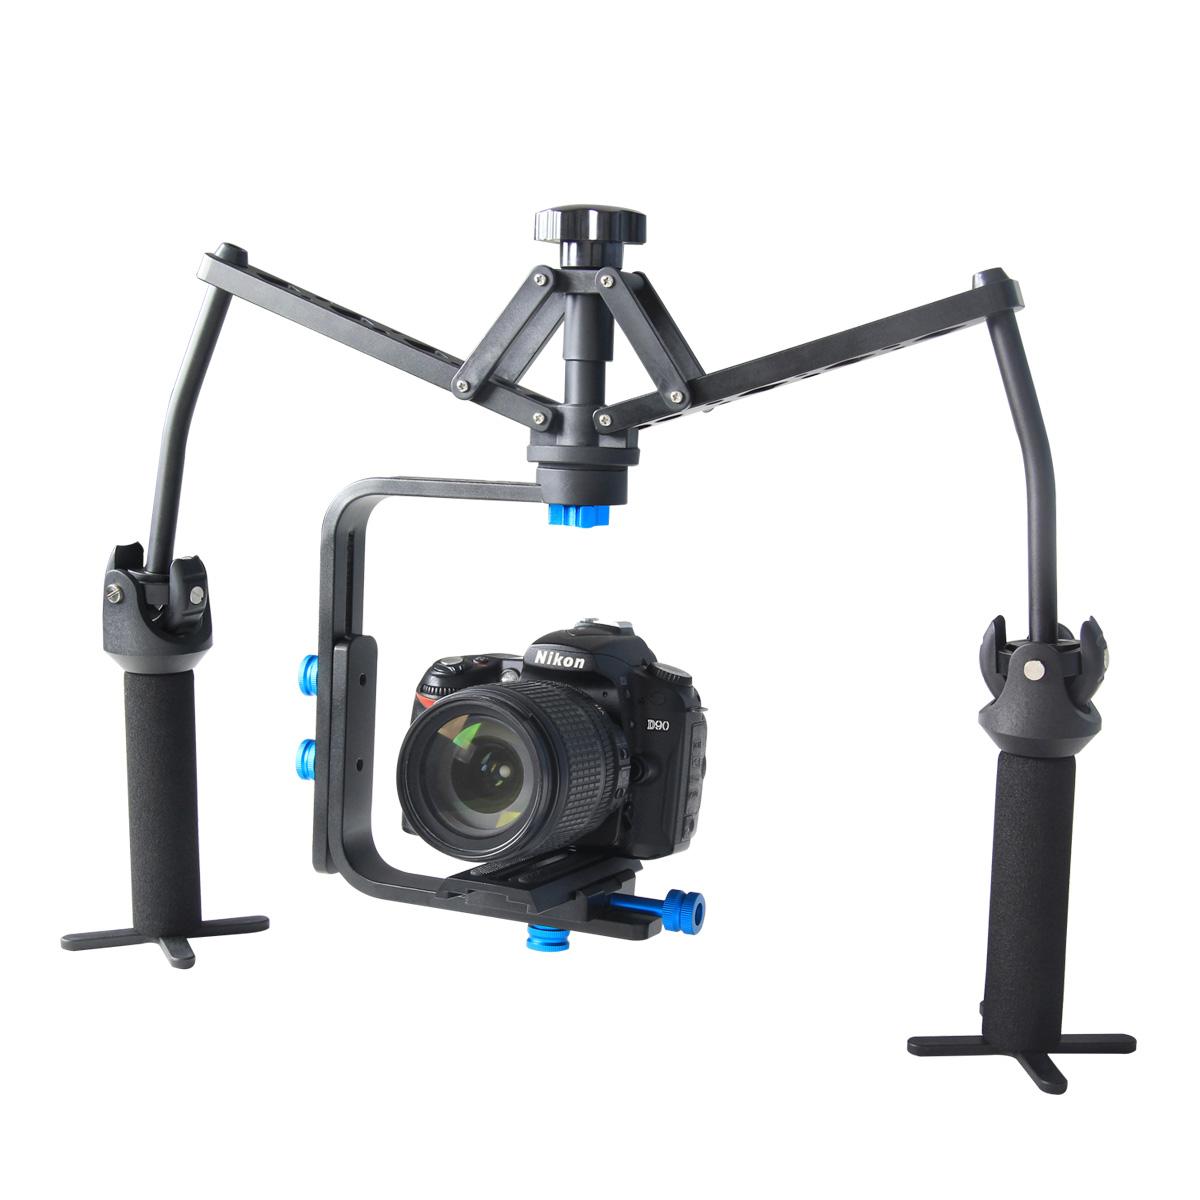 YELANGU Spider 3-Axis Gimbal Handheld Steadicam Stabilizer Support DV, DSLR Camcorder